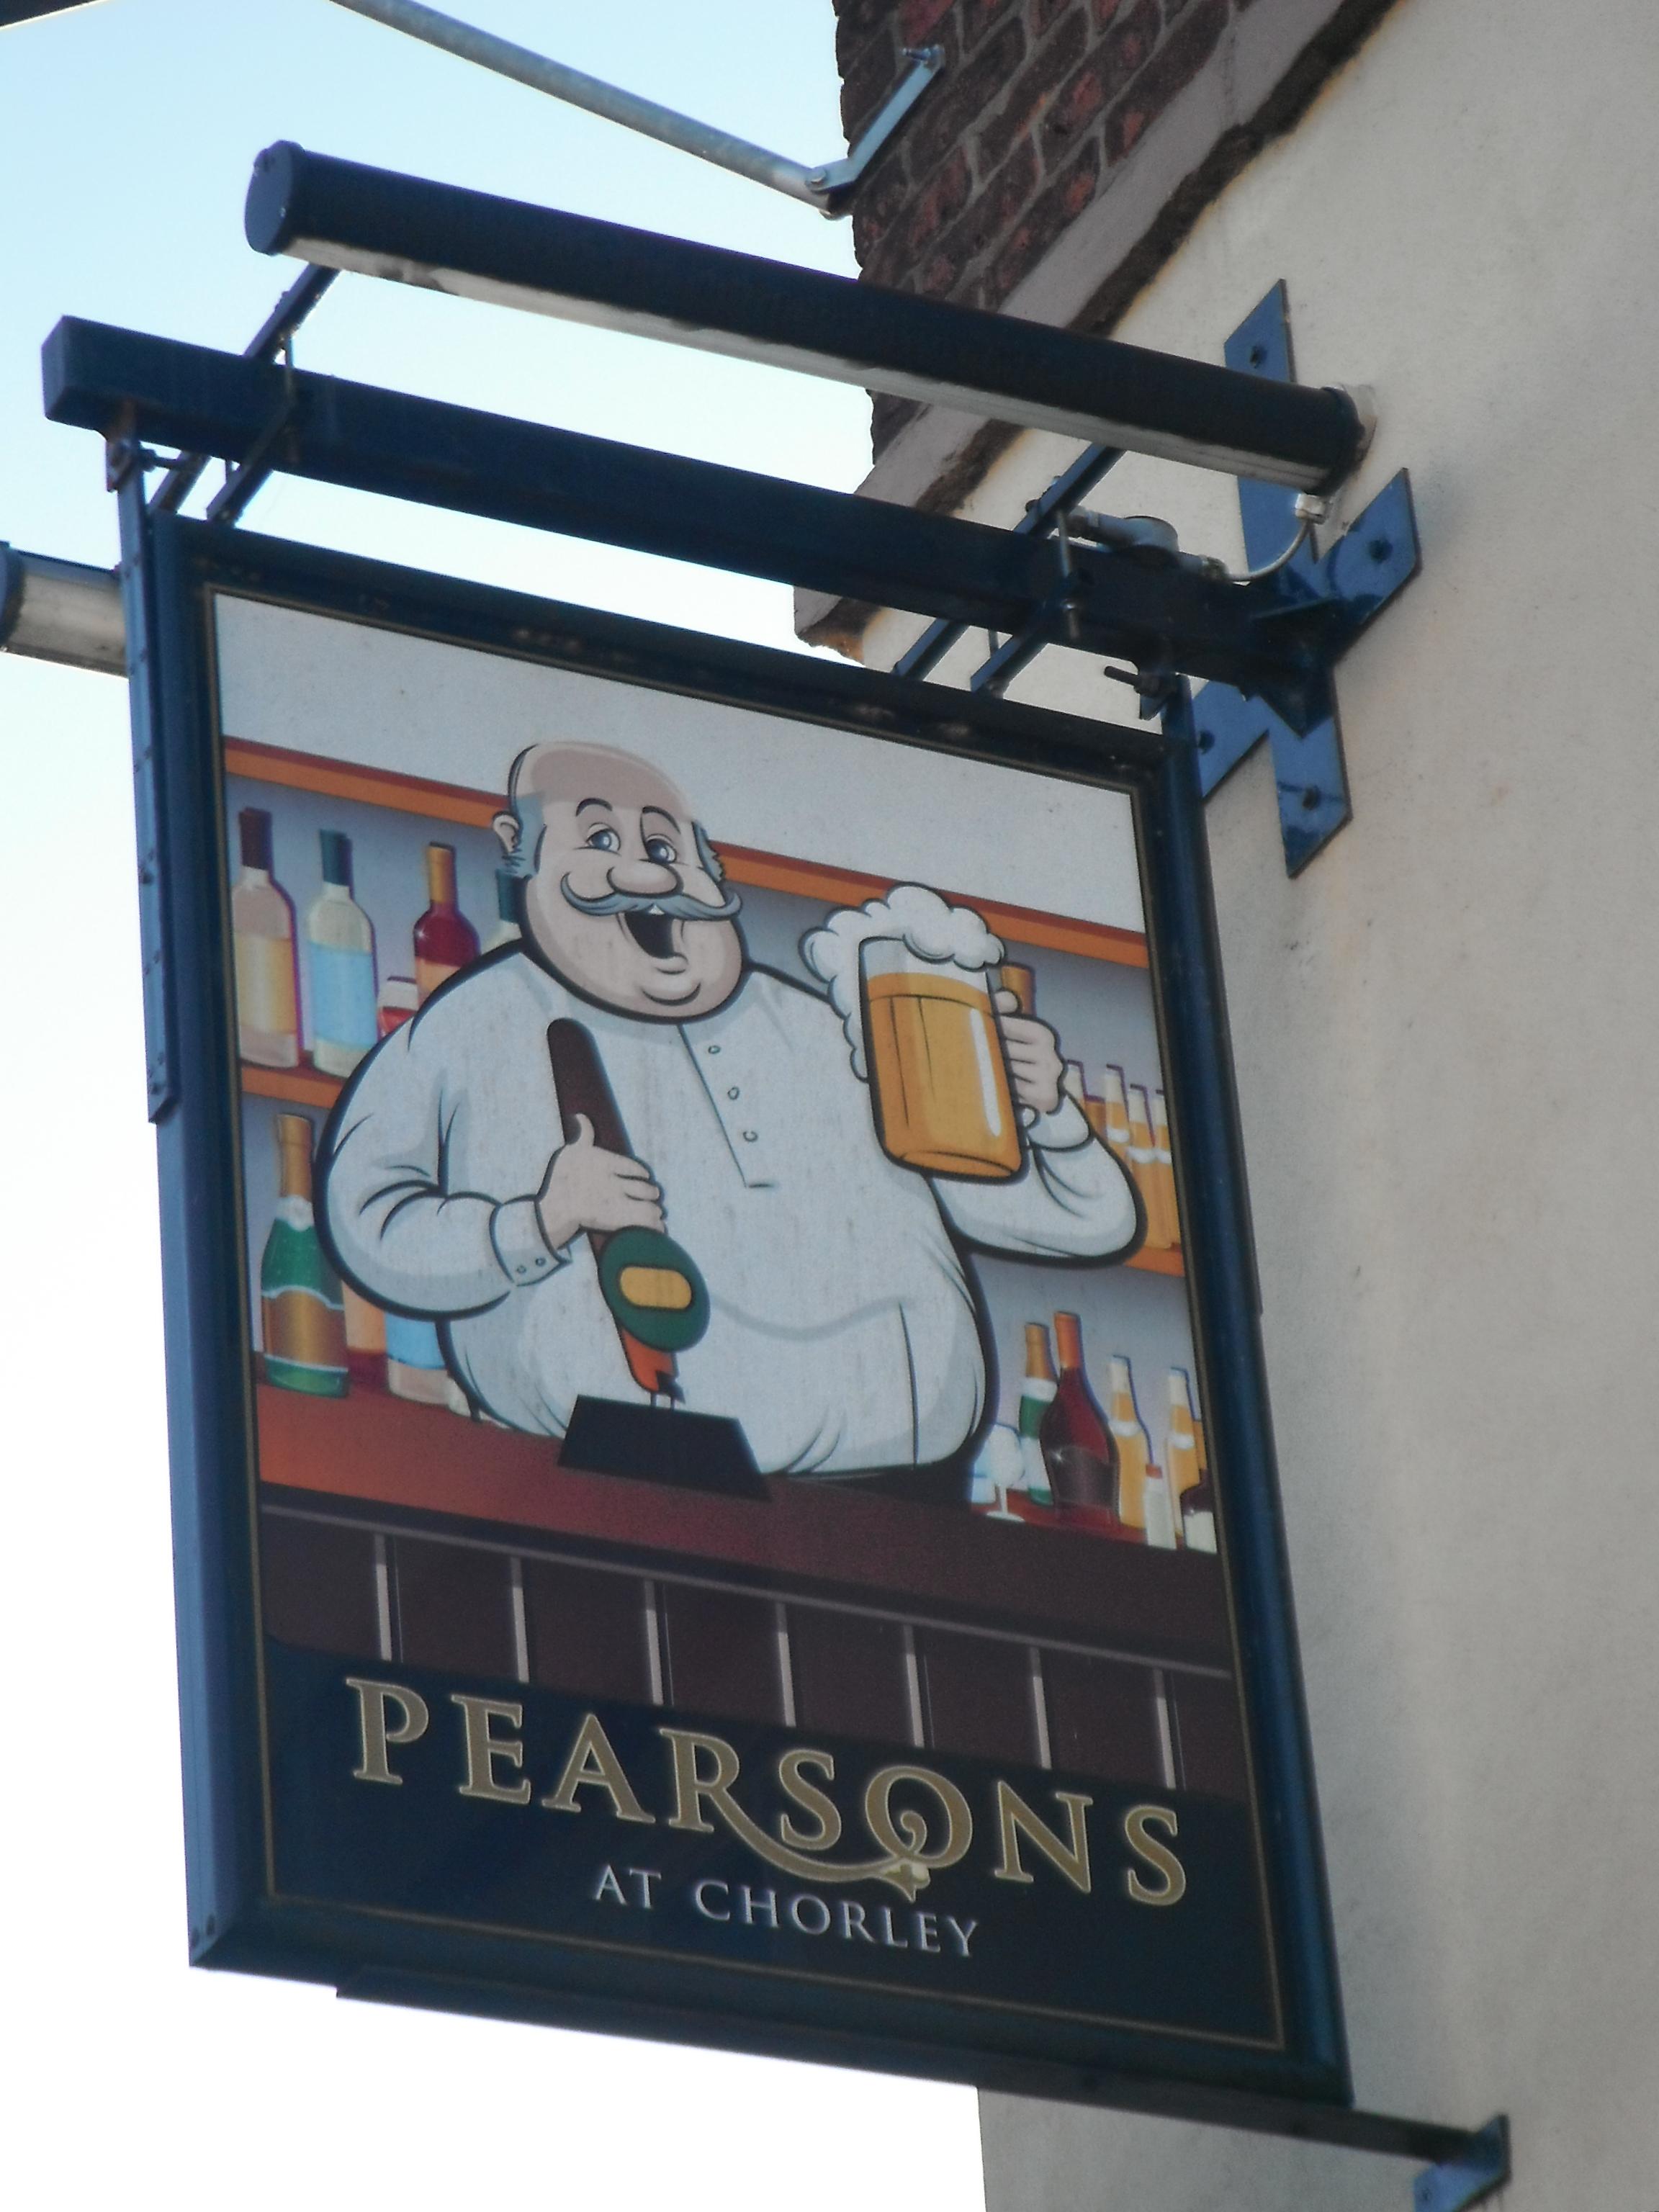 Photo taken by me – Pearsons pub Sign, Chorlton